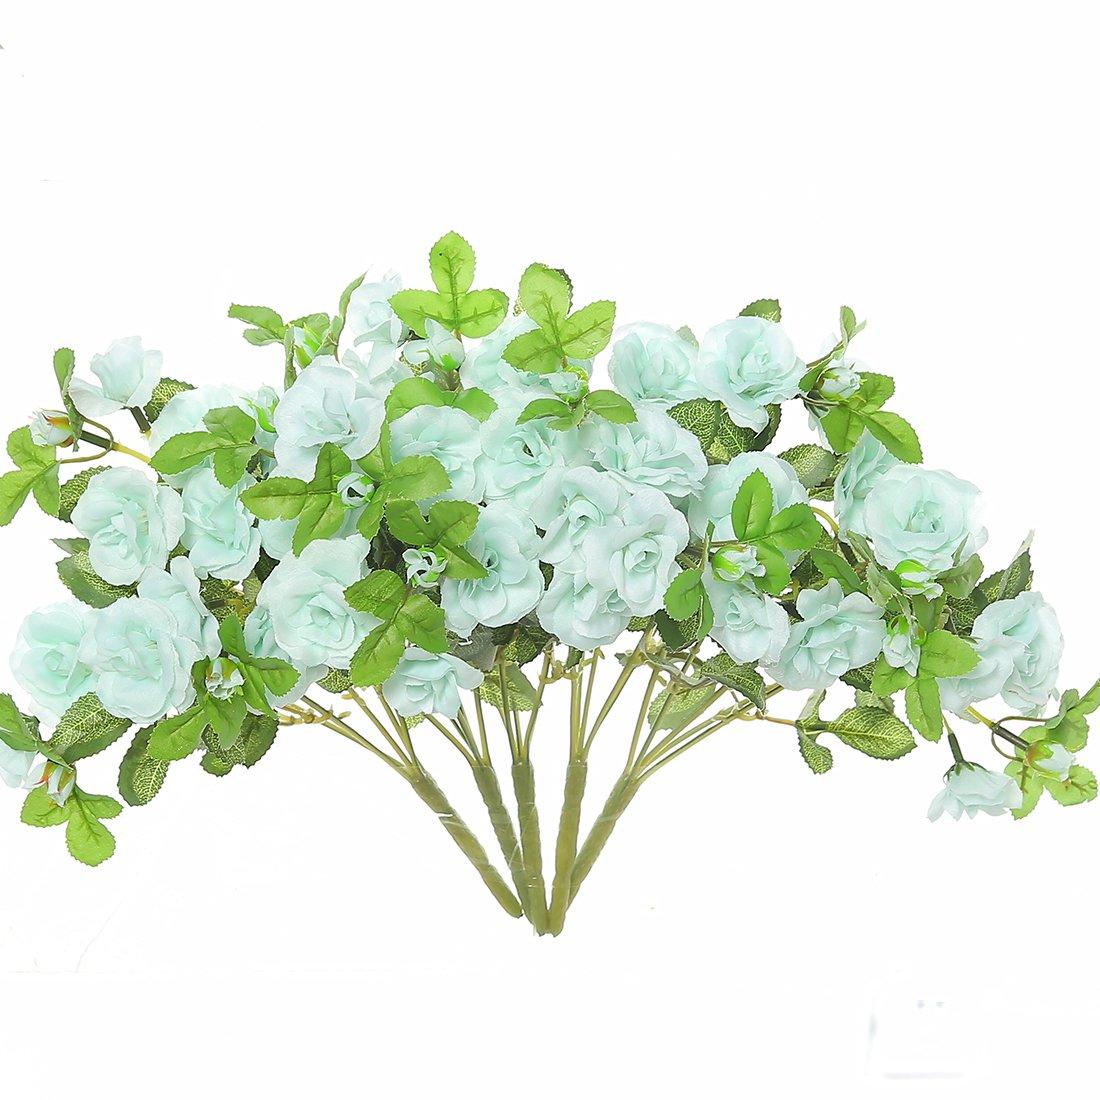 JUSTOYOU Artificial Silk Mini Roses Flowers Bouquet for Homes Table Wedding Arrangement (5, Light Blue)